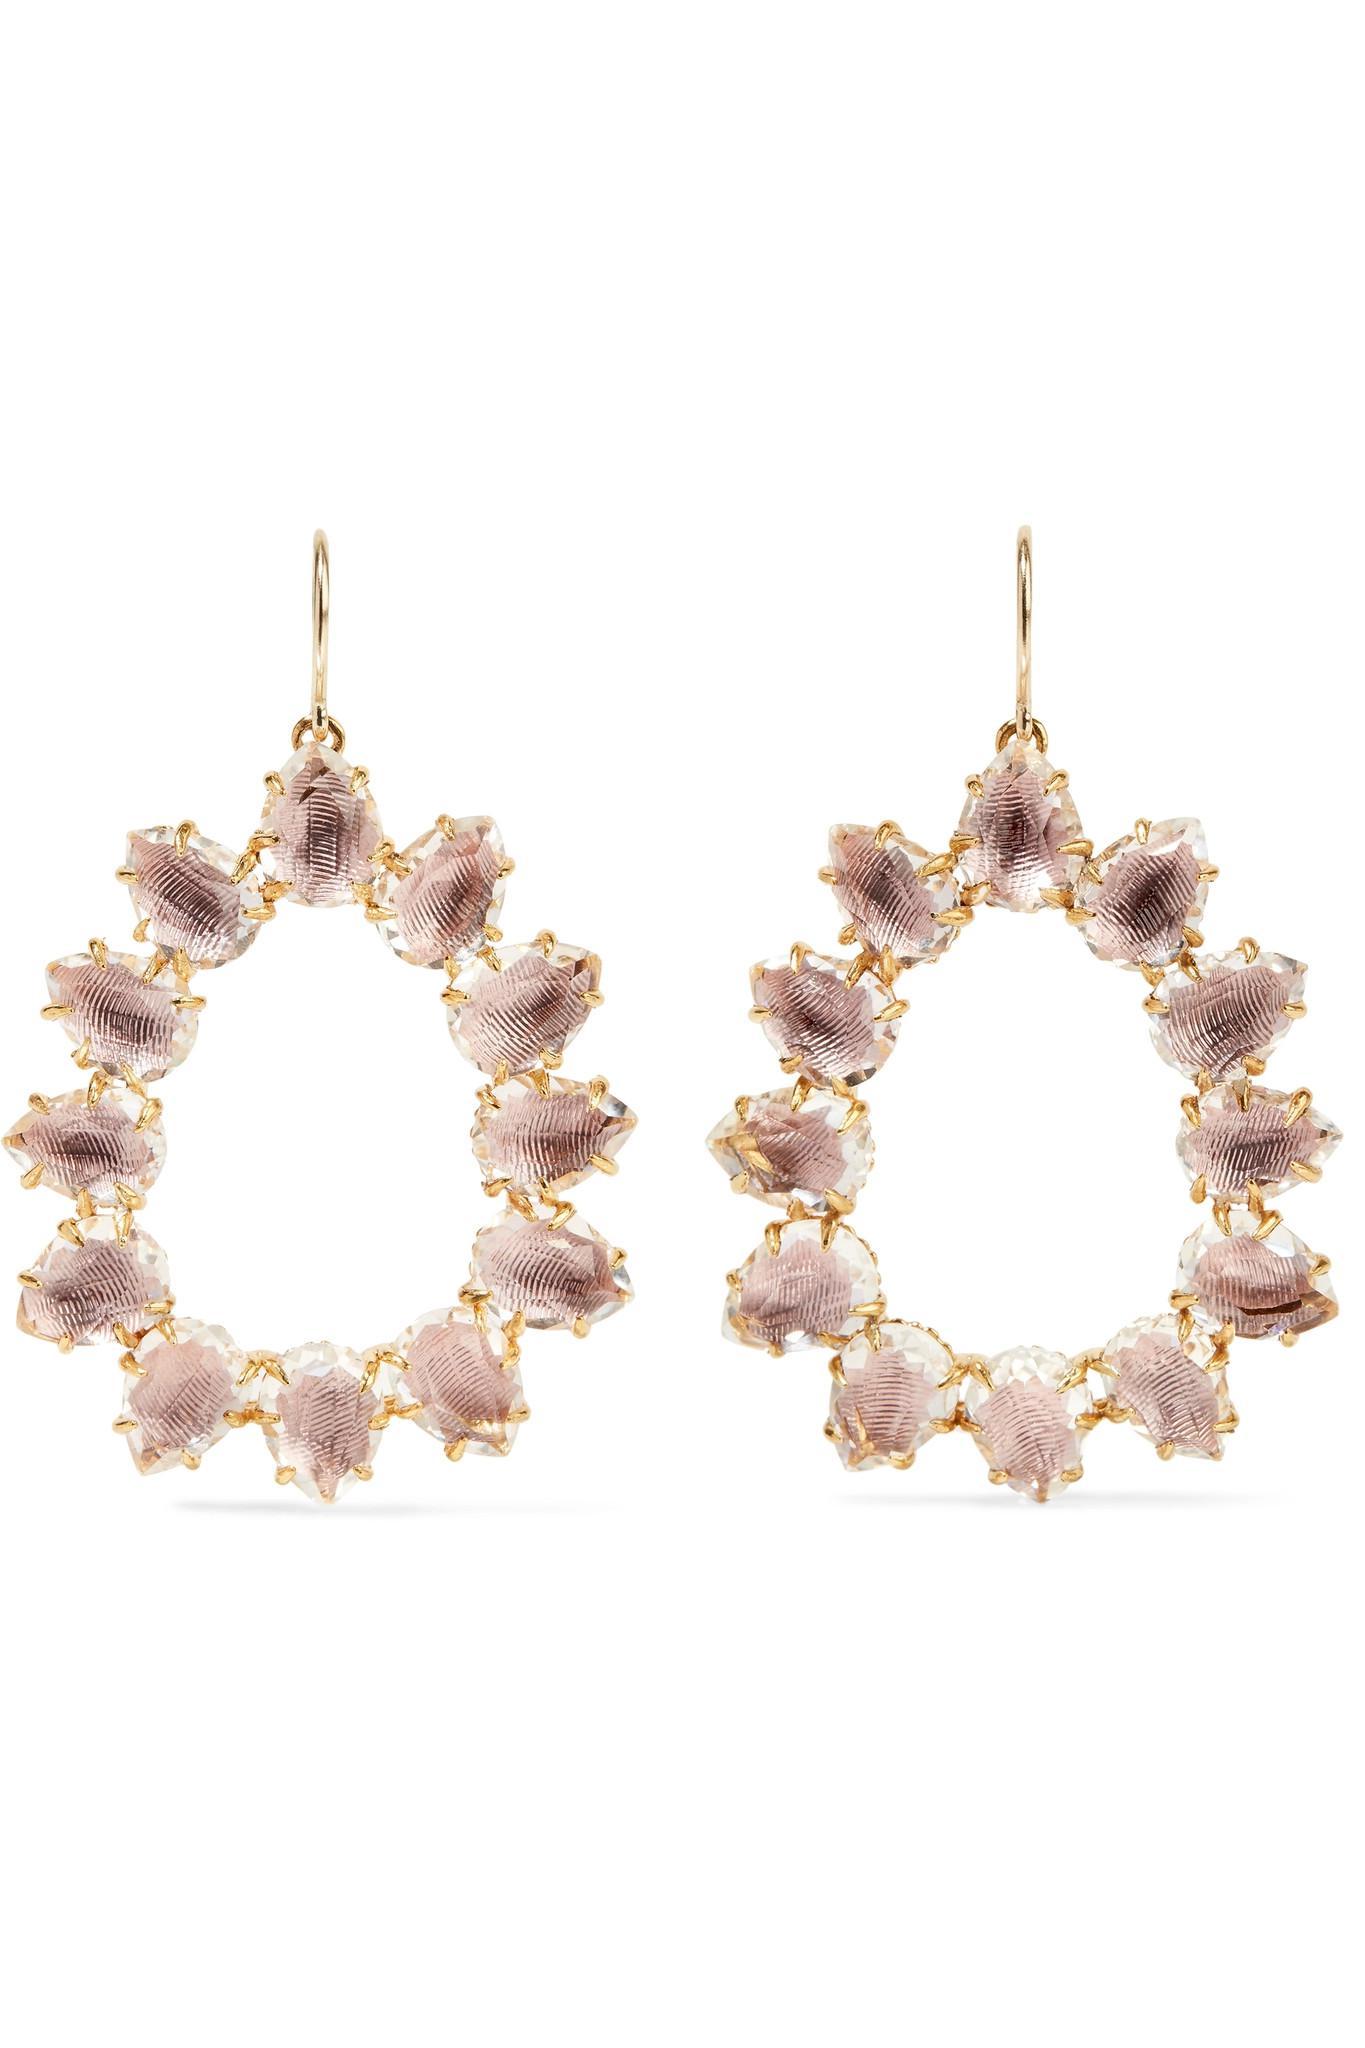 Larkspur & Hawk Caterina Small Frame Earrings, White Quartz